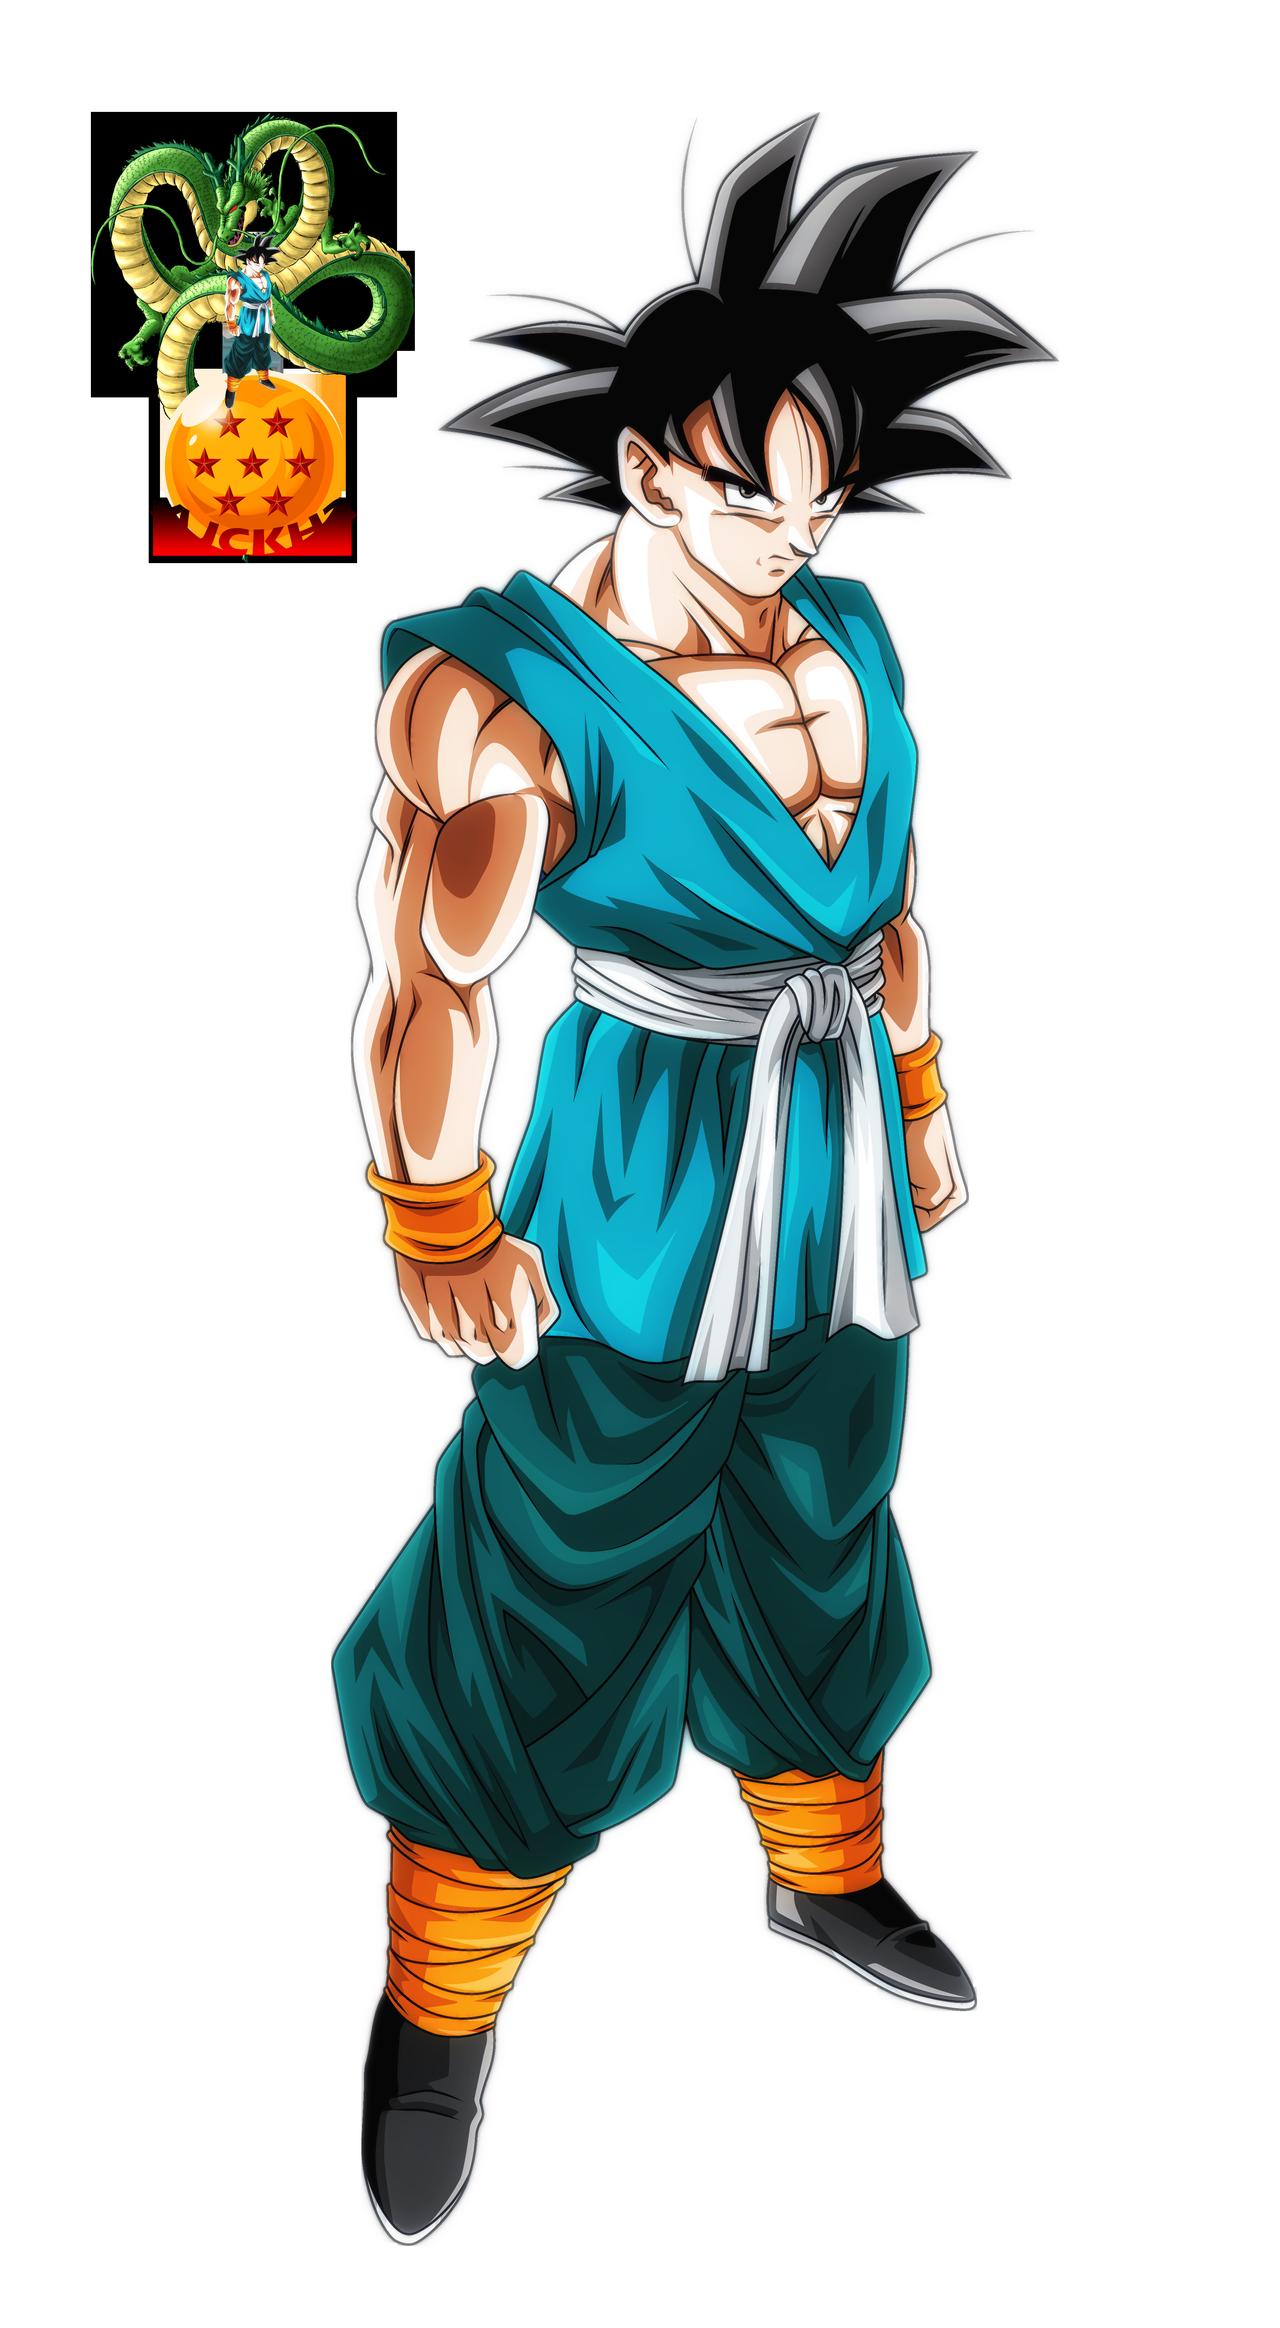 Ultimate Saiyan Son Goku By Ajckh2 On Deviantart Anime Dragon Ball Super Dragon Ball Super Goku Goku